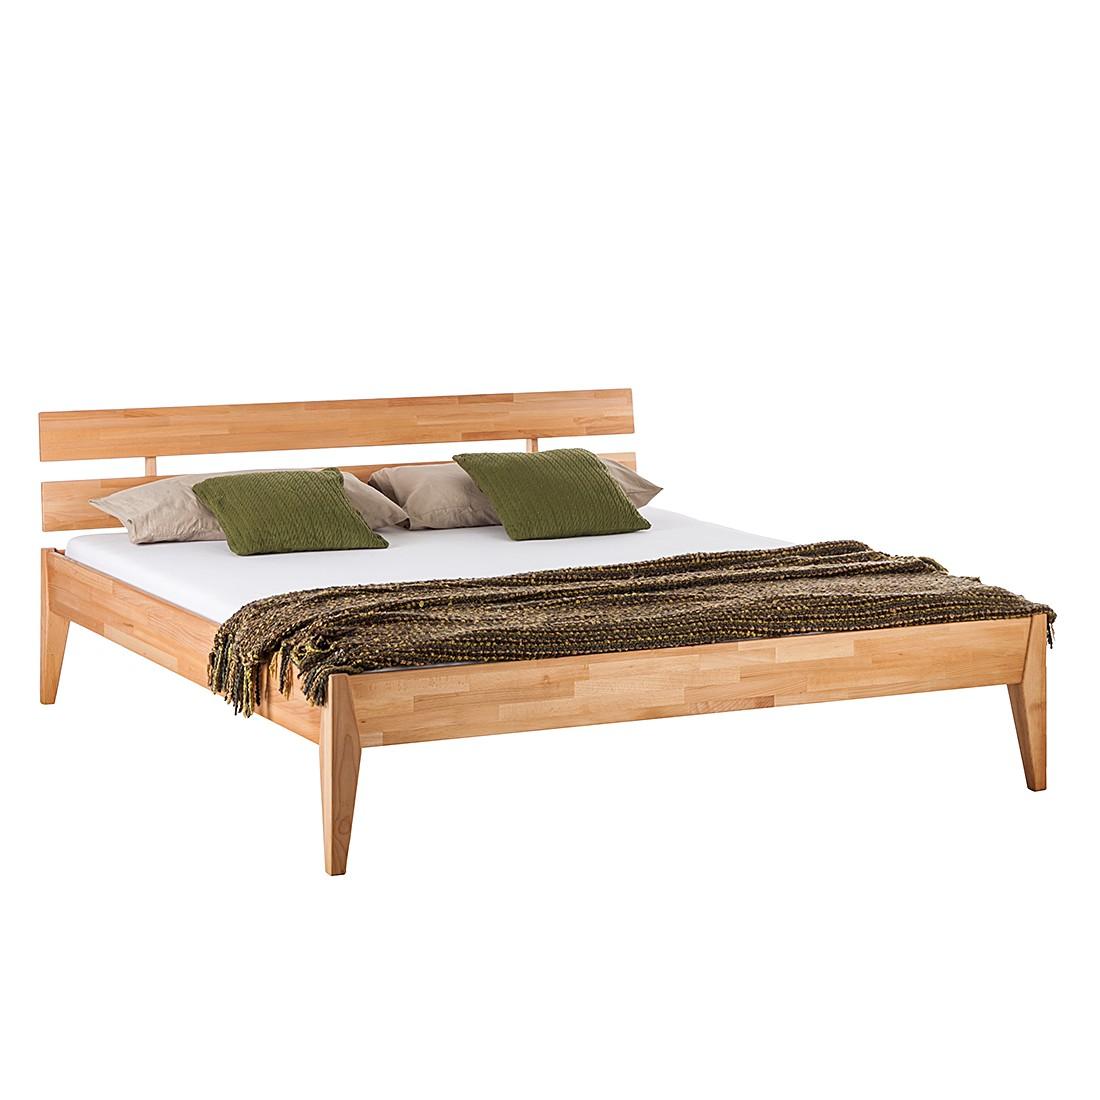 Massief houten bed JillWOOD, Ars Natura